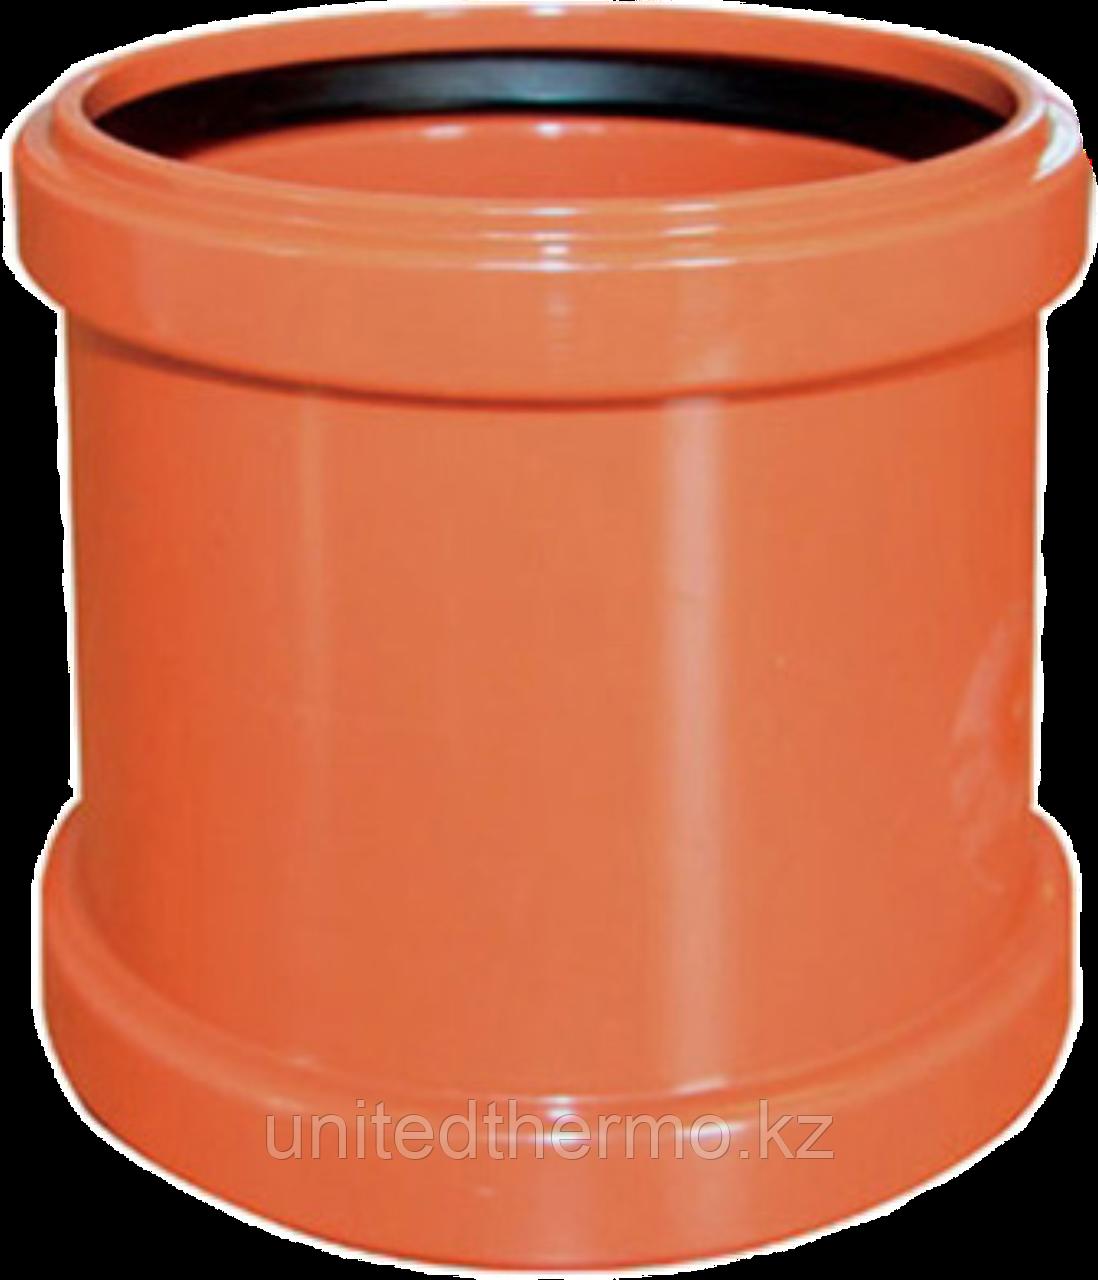 Муфта ПП д160 (4.9мм) оранжевая